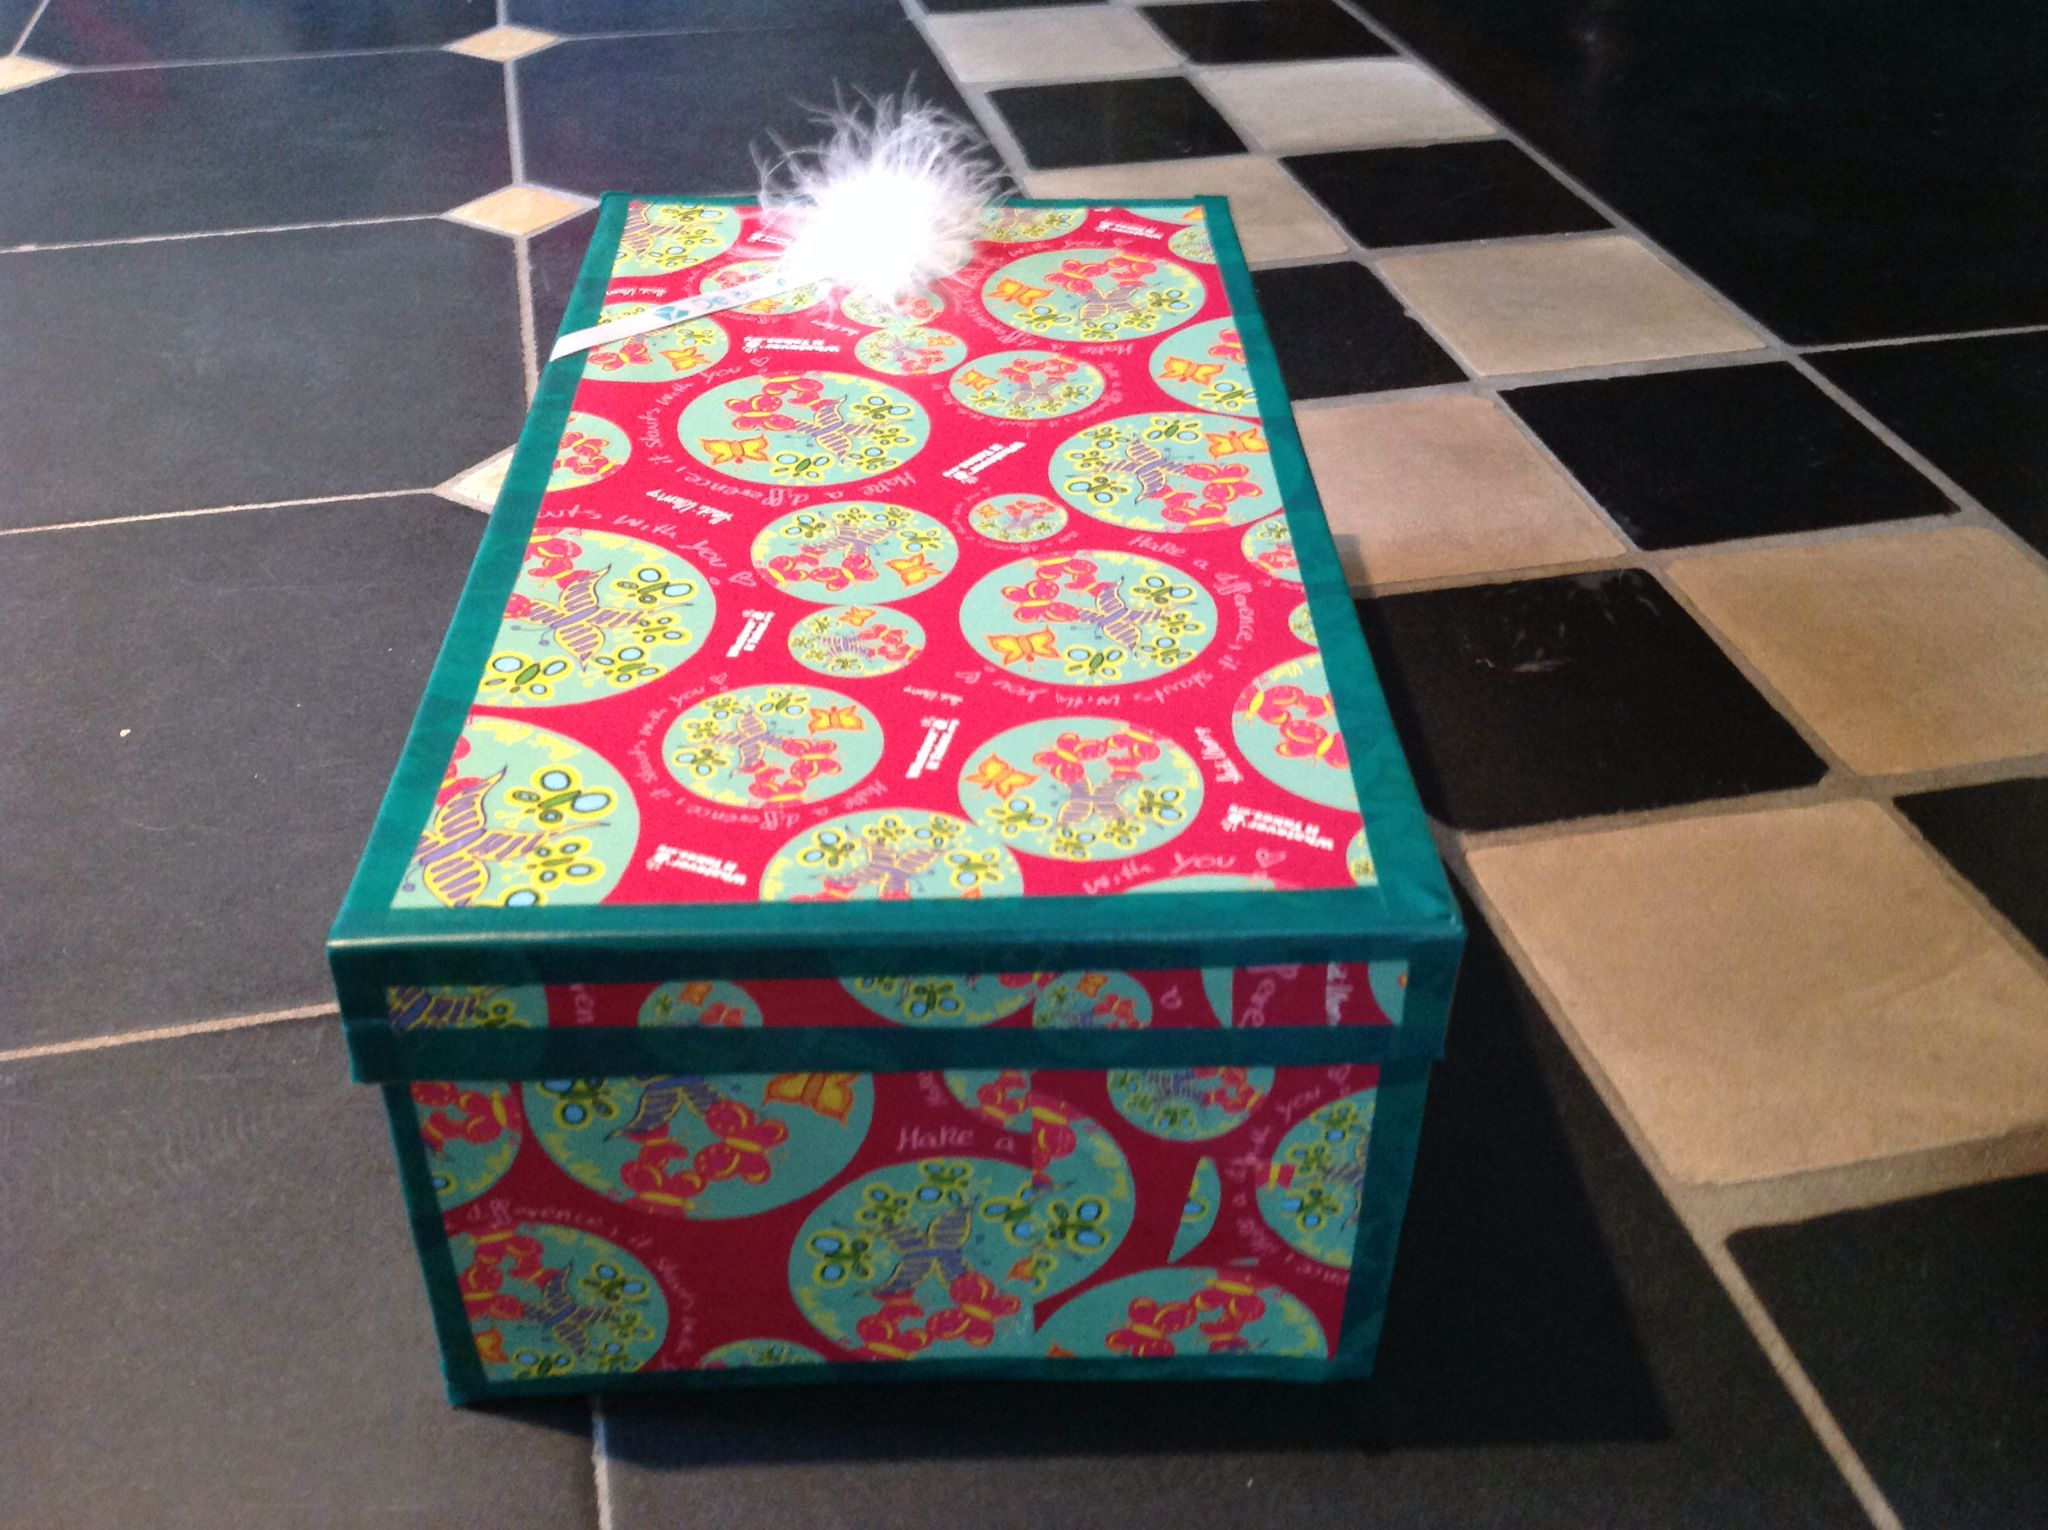 Magnifiek Leuke doos versieren | DOZEN OPPIMPEN | Pinterest #IV62